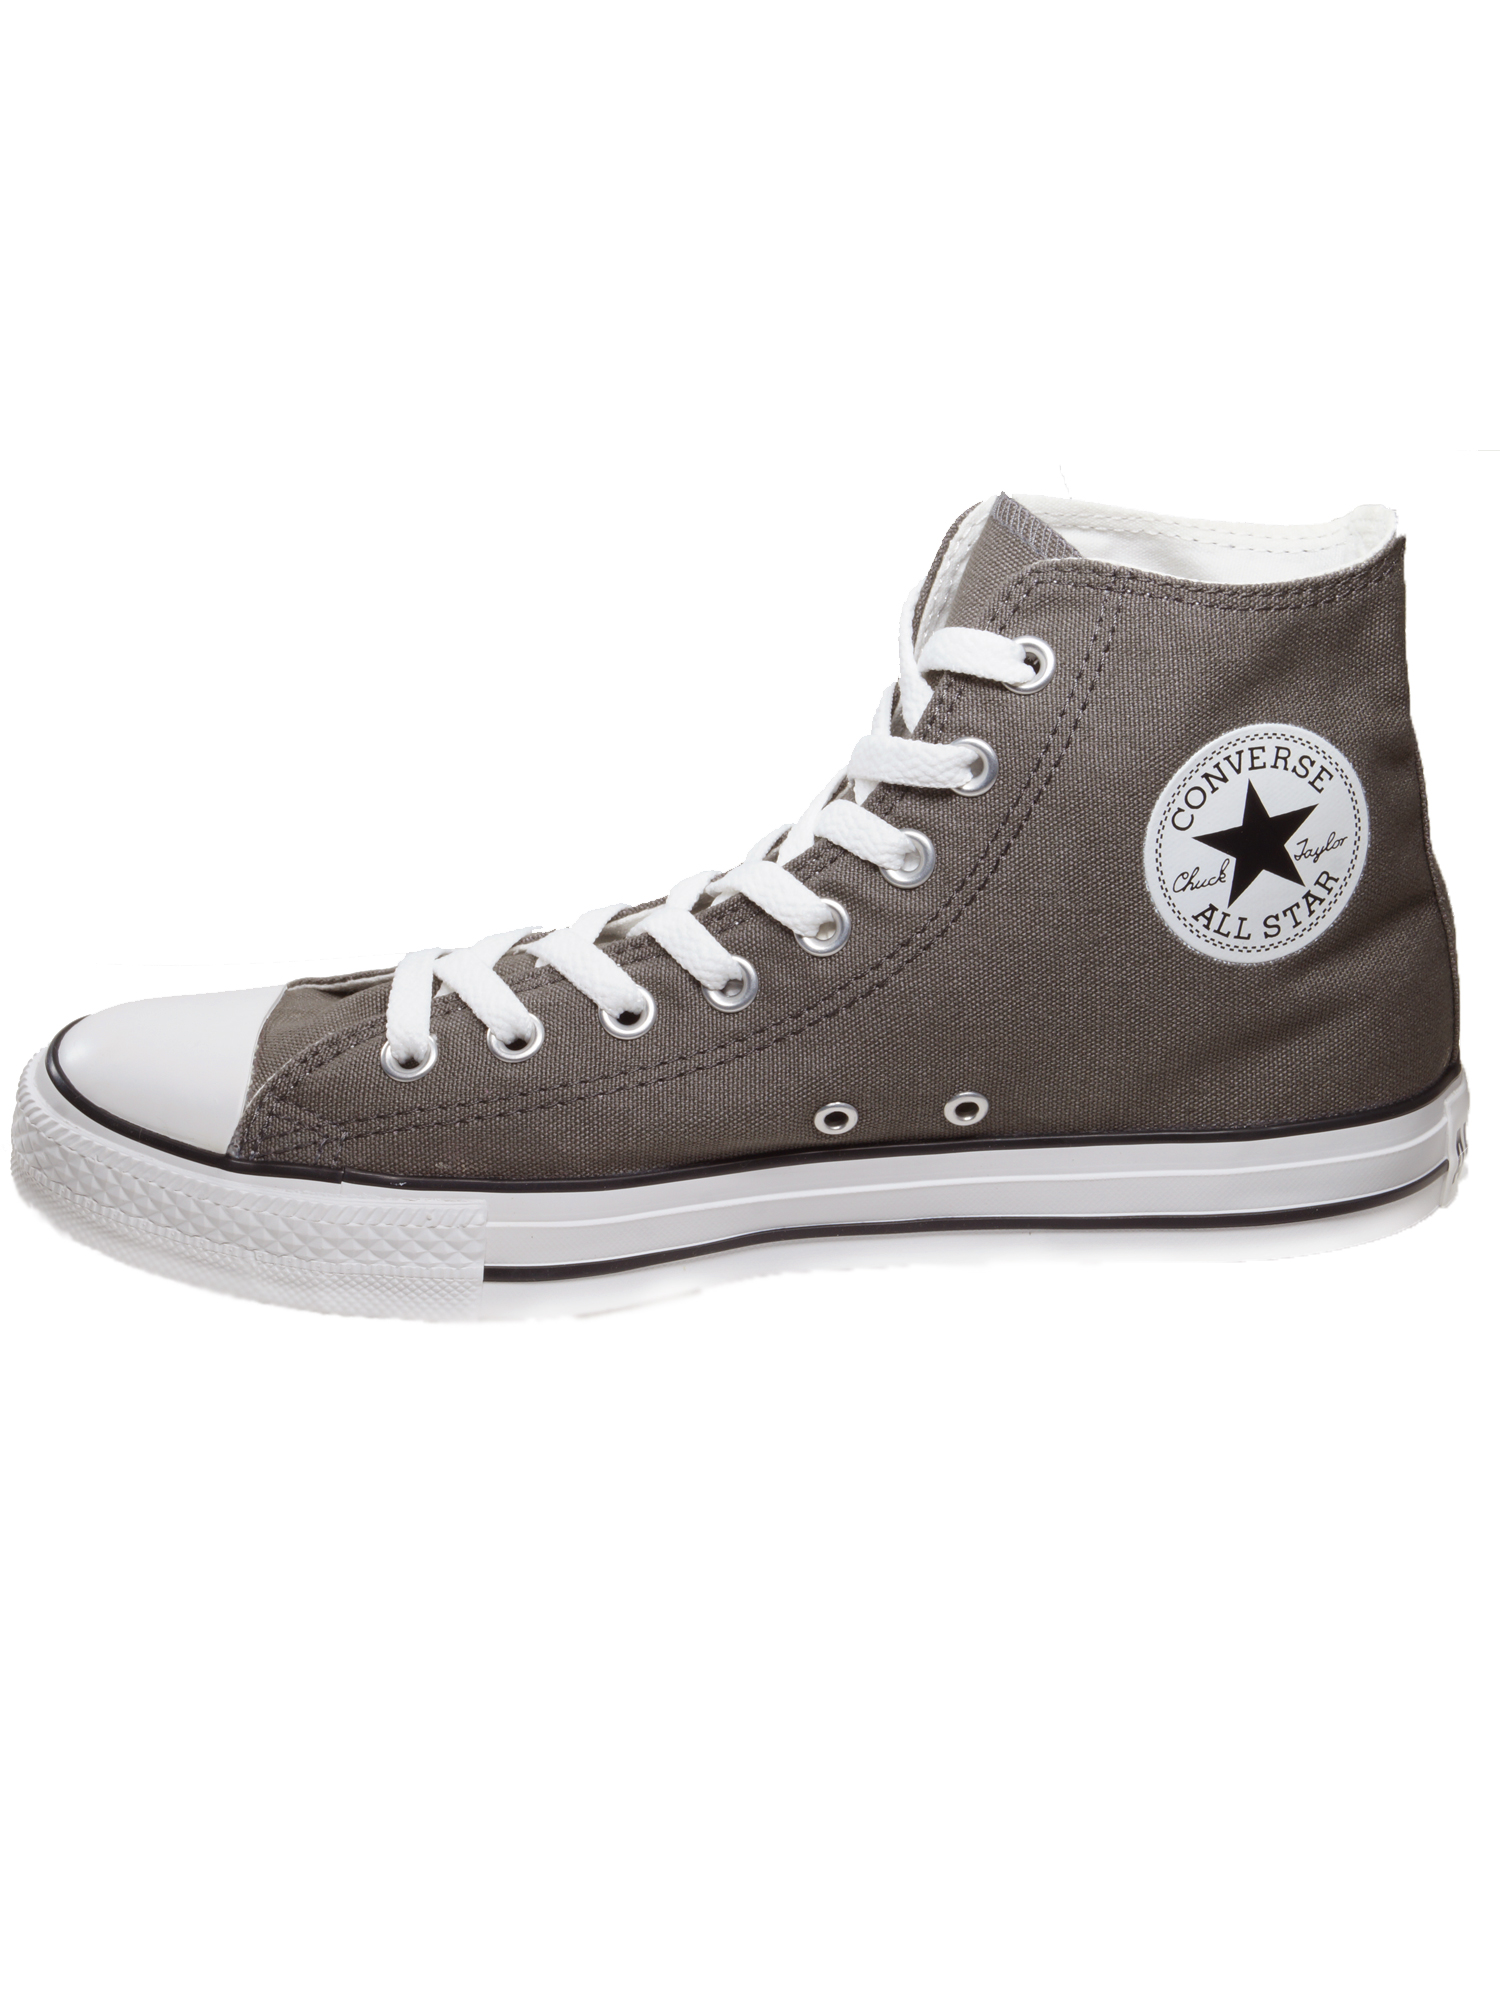 wholesale dealer 59d15 cf271 Converse Herren Schuhe CT Spec Hi Grau Leinen Sneakers Größe 43